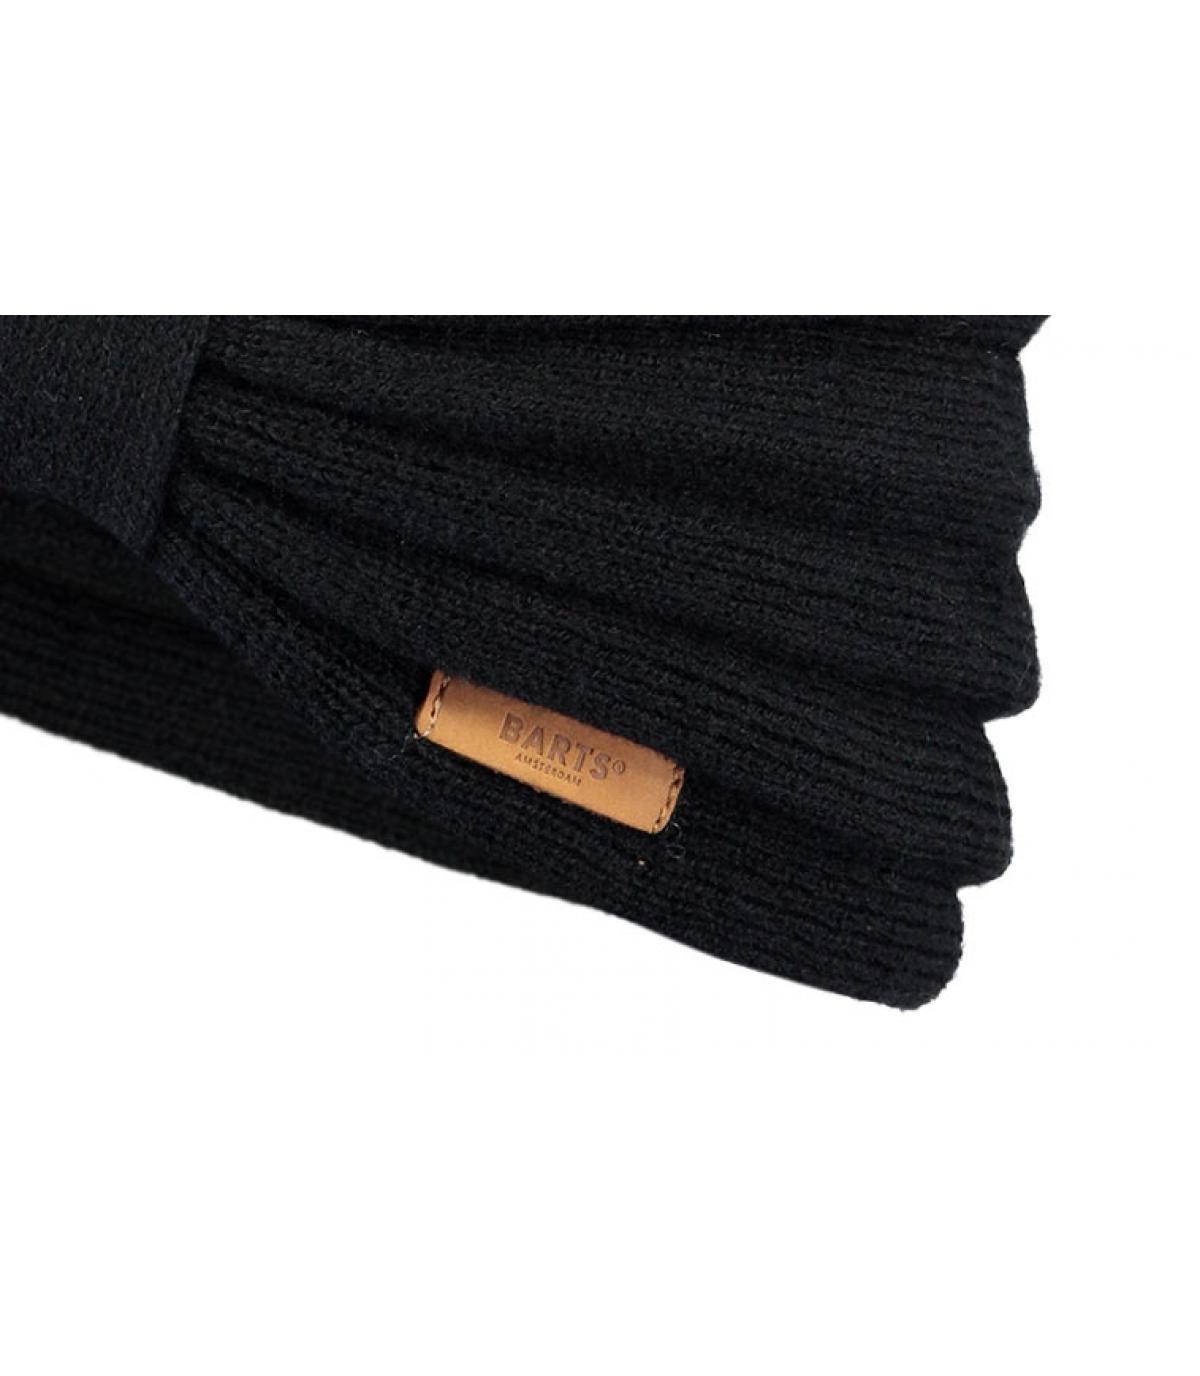 Detalles Zitoun Headband black imagen 3